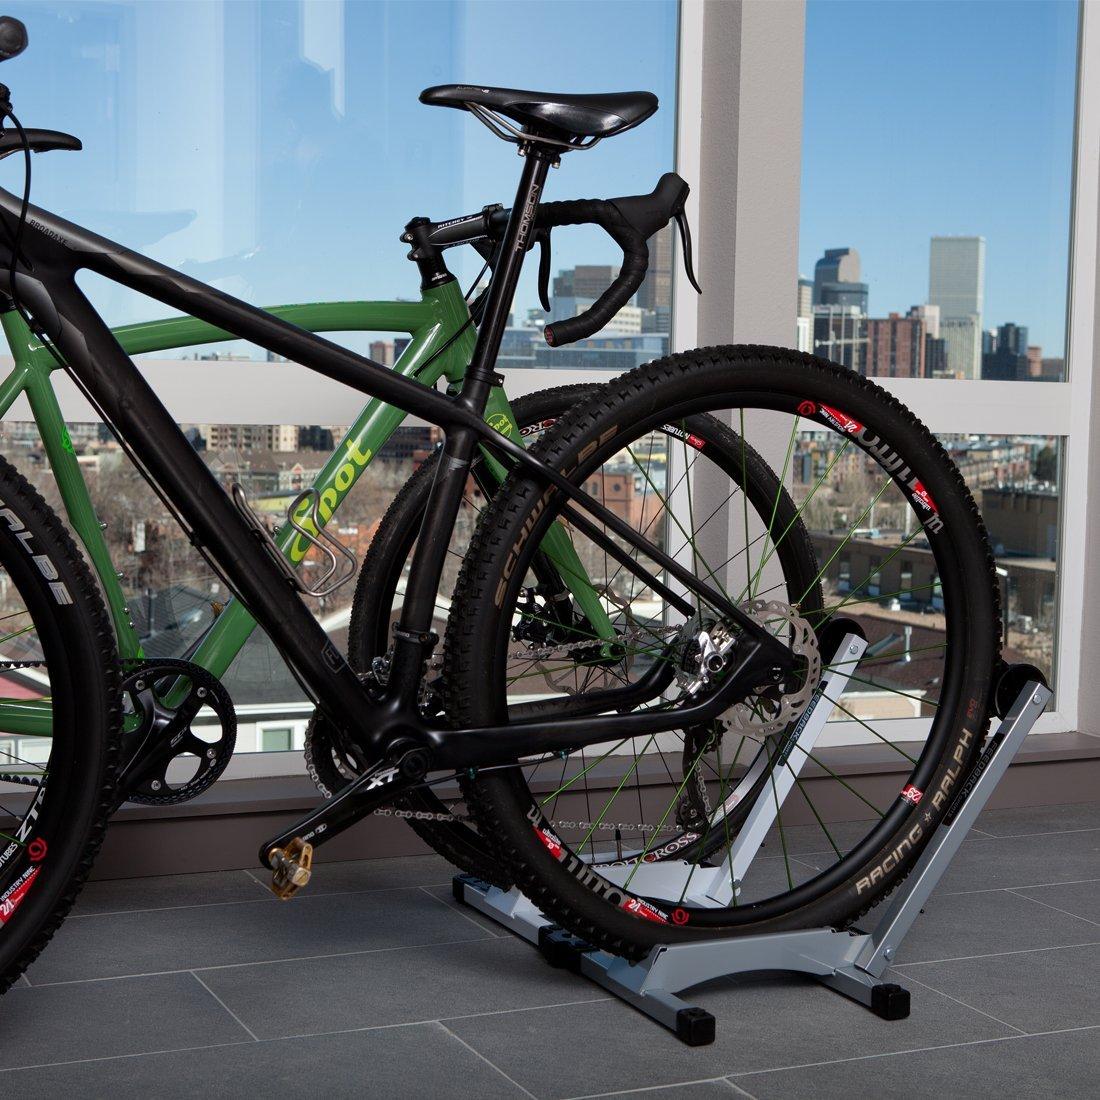 Freestanding Bike Storage And Display Stand